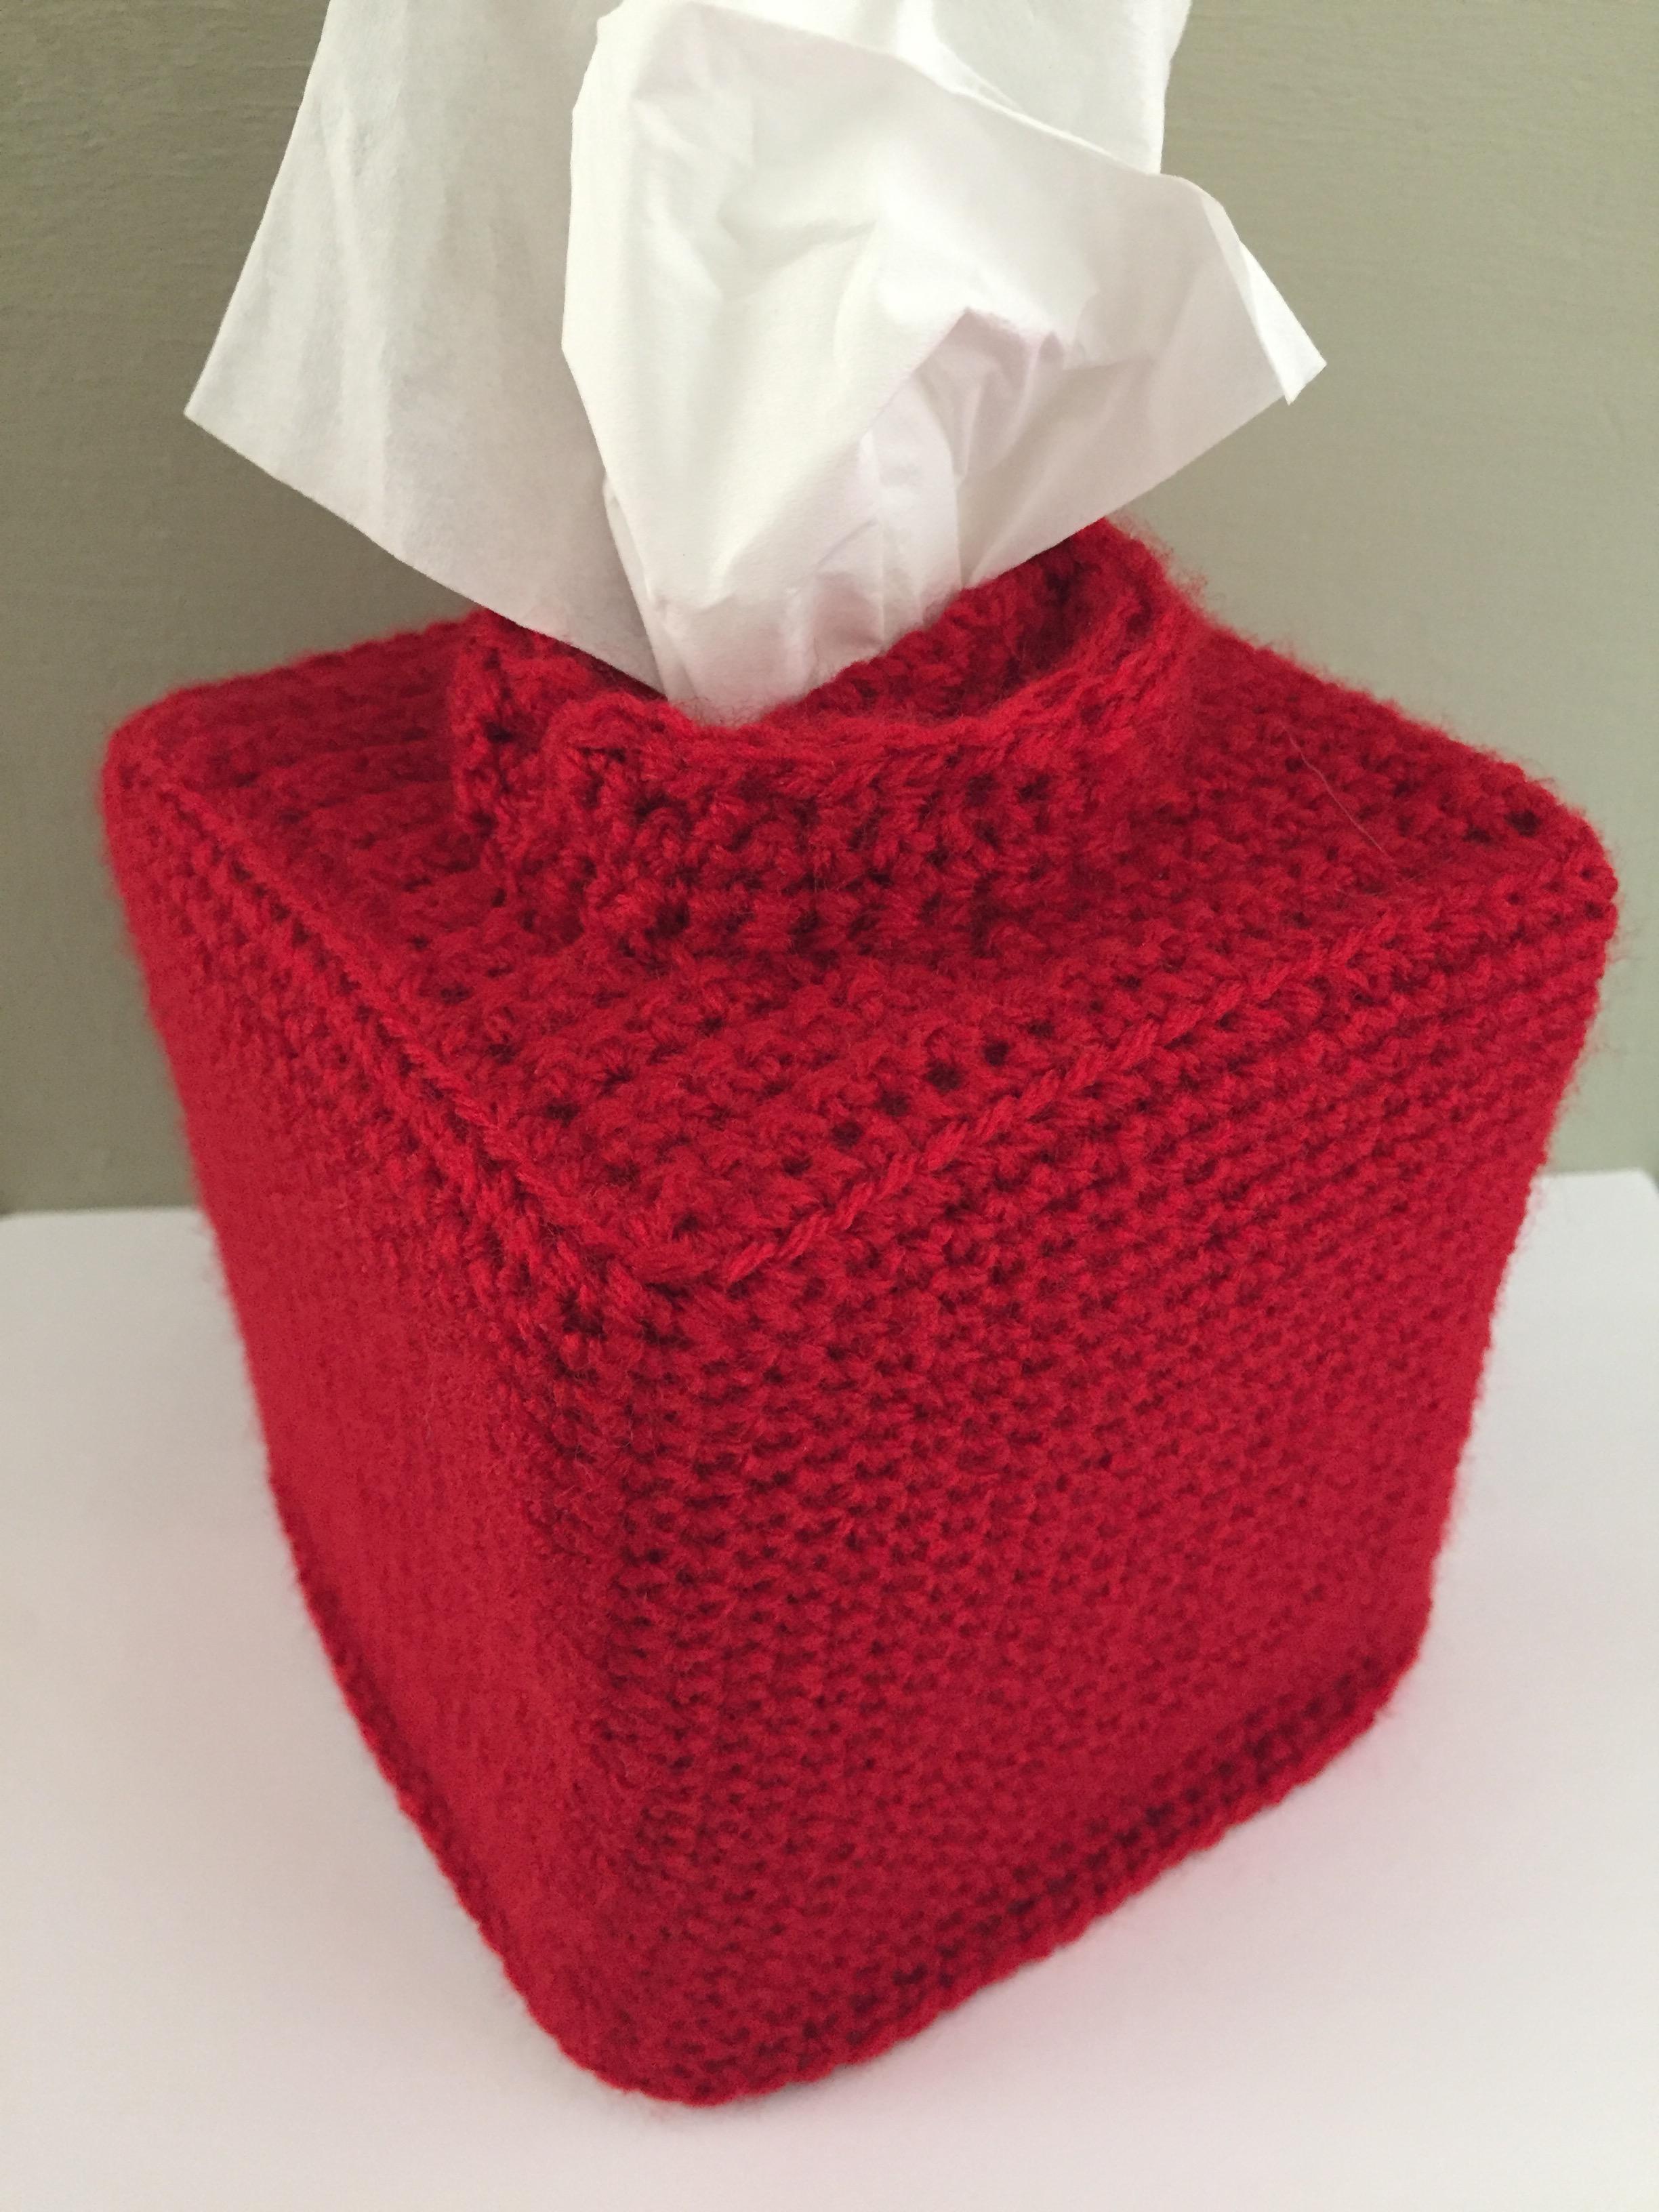 Crochet Lego Tissue Box Cover Hook Stitch Sew